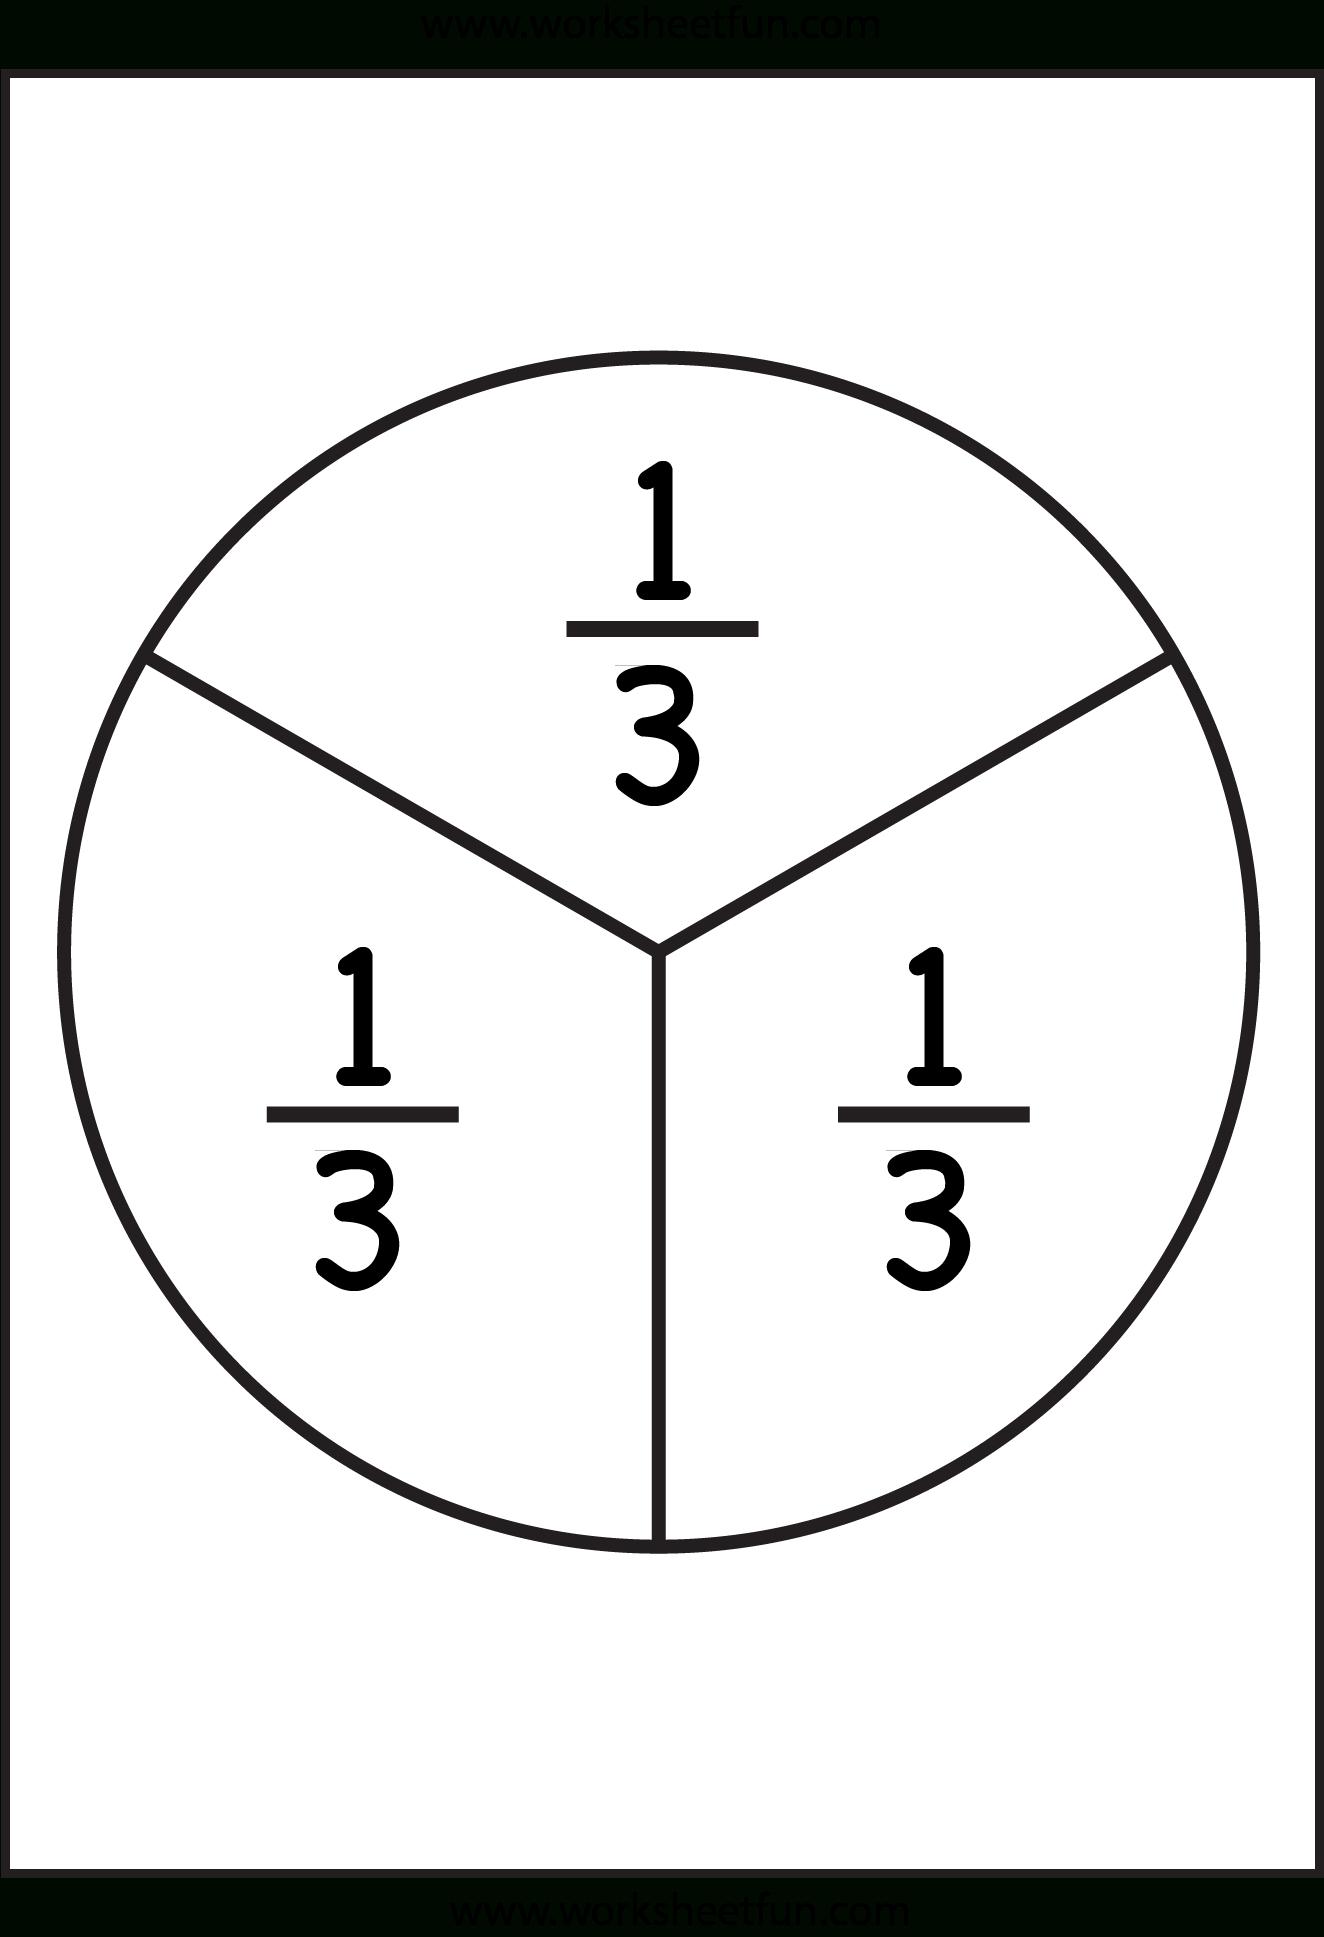 Fraction Circles - 11 Worksheets - 1/2,1/3,1/4,1/5,1/6,1/7,1/8,1/9,1 - Free Printable Blank Fraction Circles